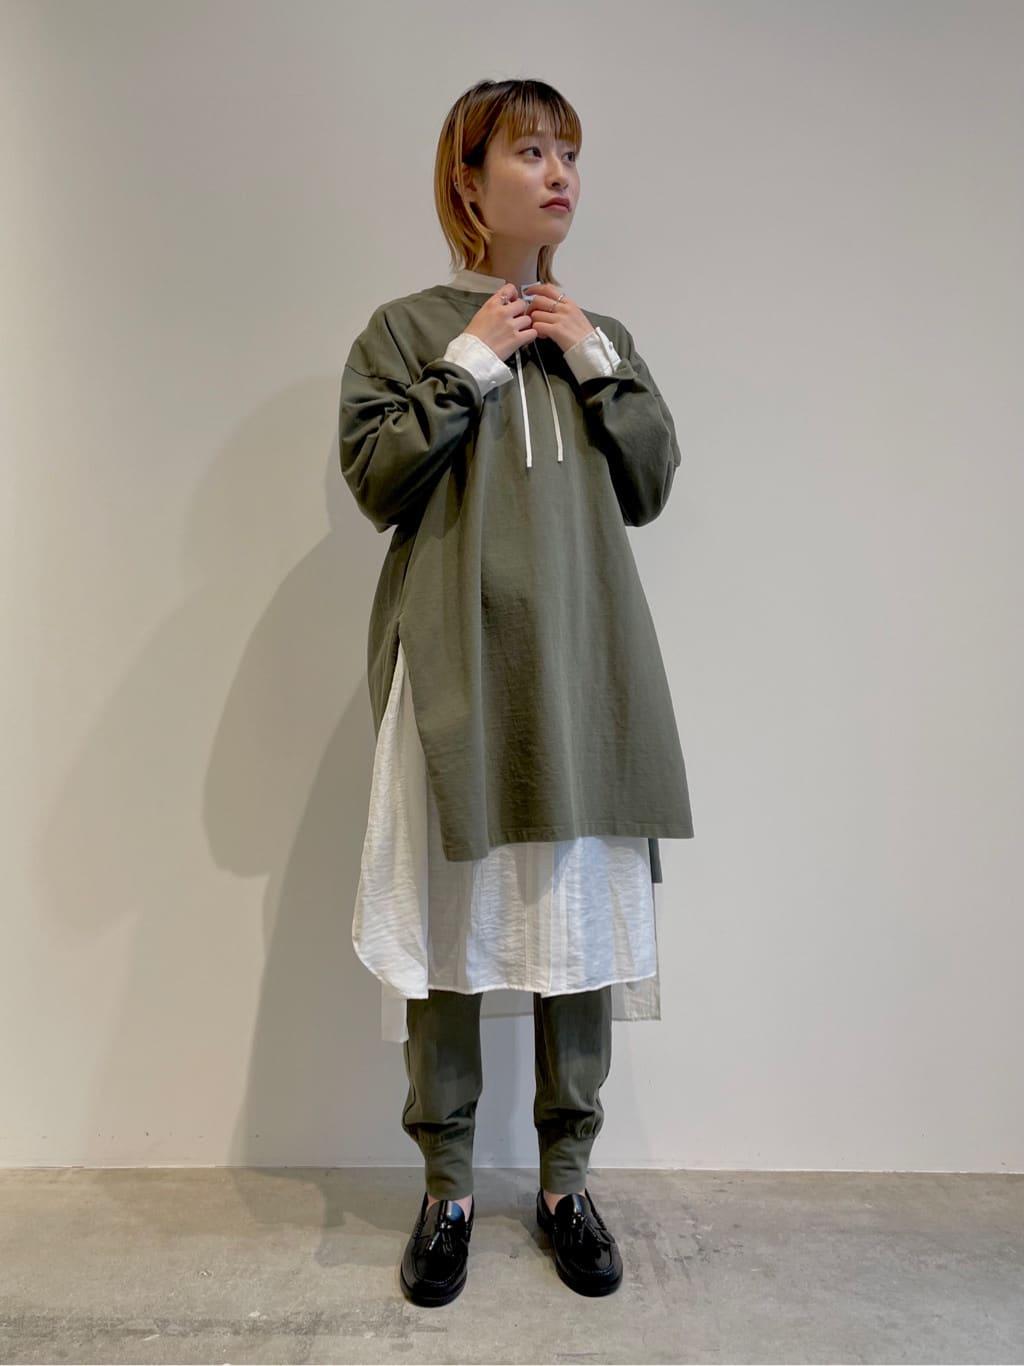 - bulle de savon FLAT AMB 名古屋栄路面 身長:162cm 2021.09.09